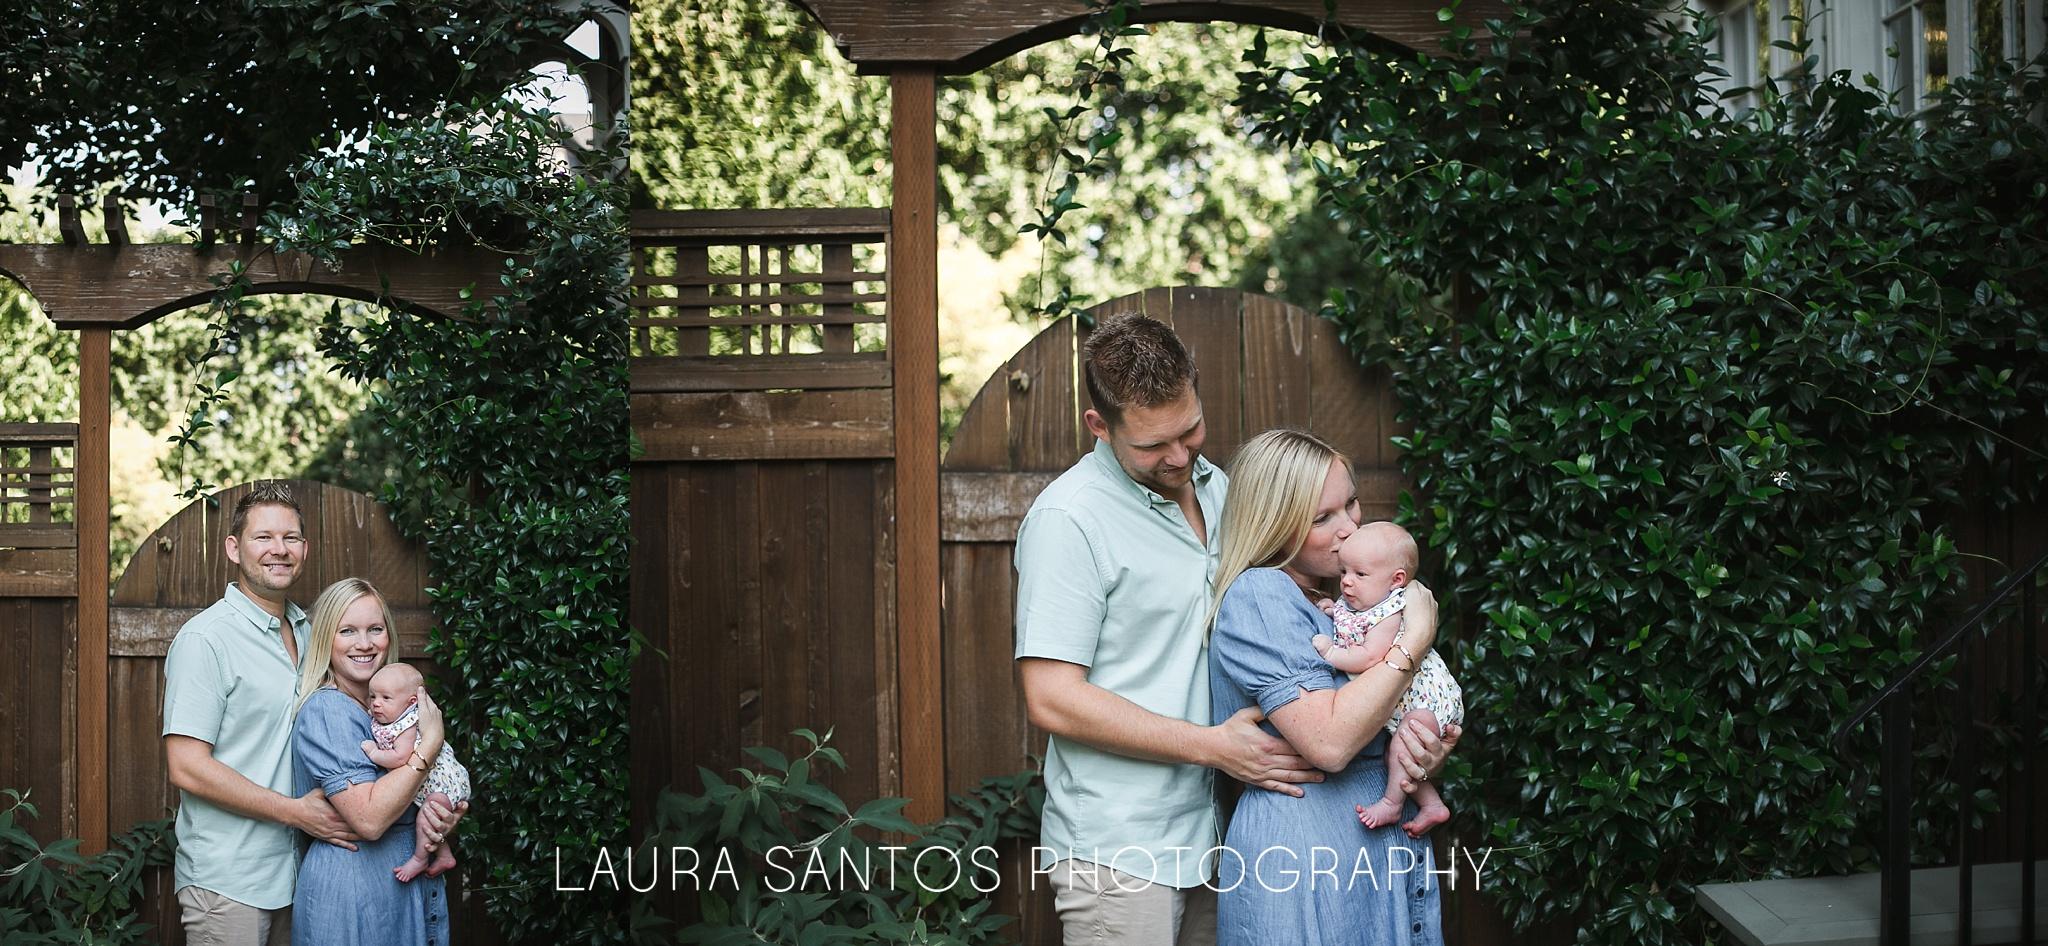 Laura Santos Photography Portland Oregon Family Photographer_0257.jpg